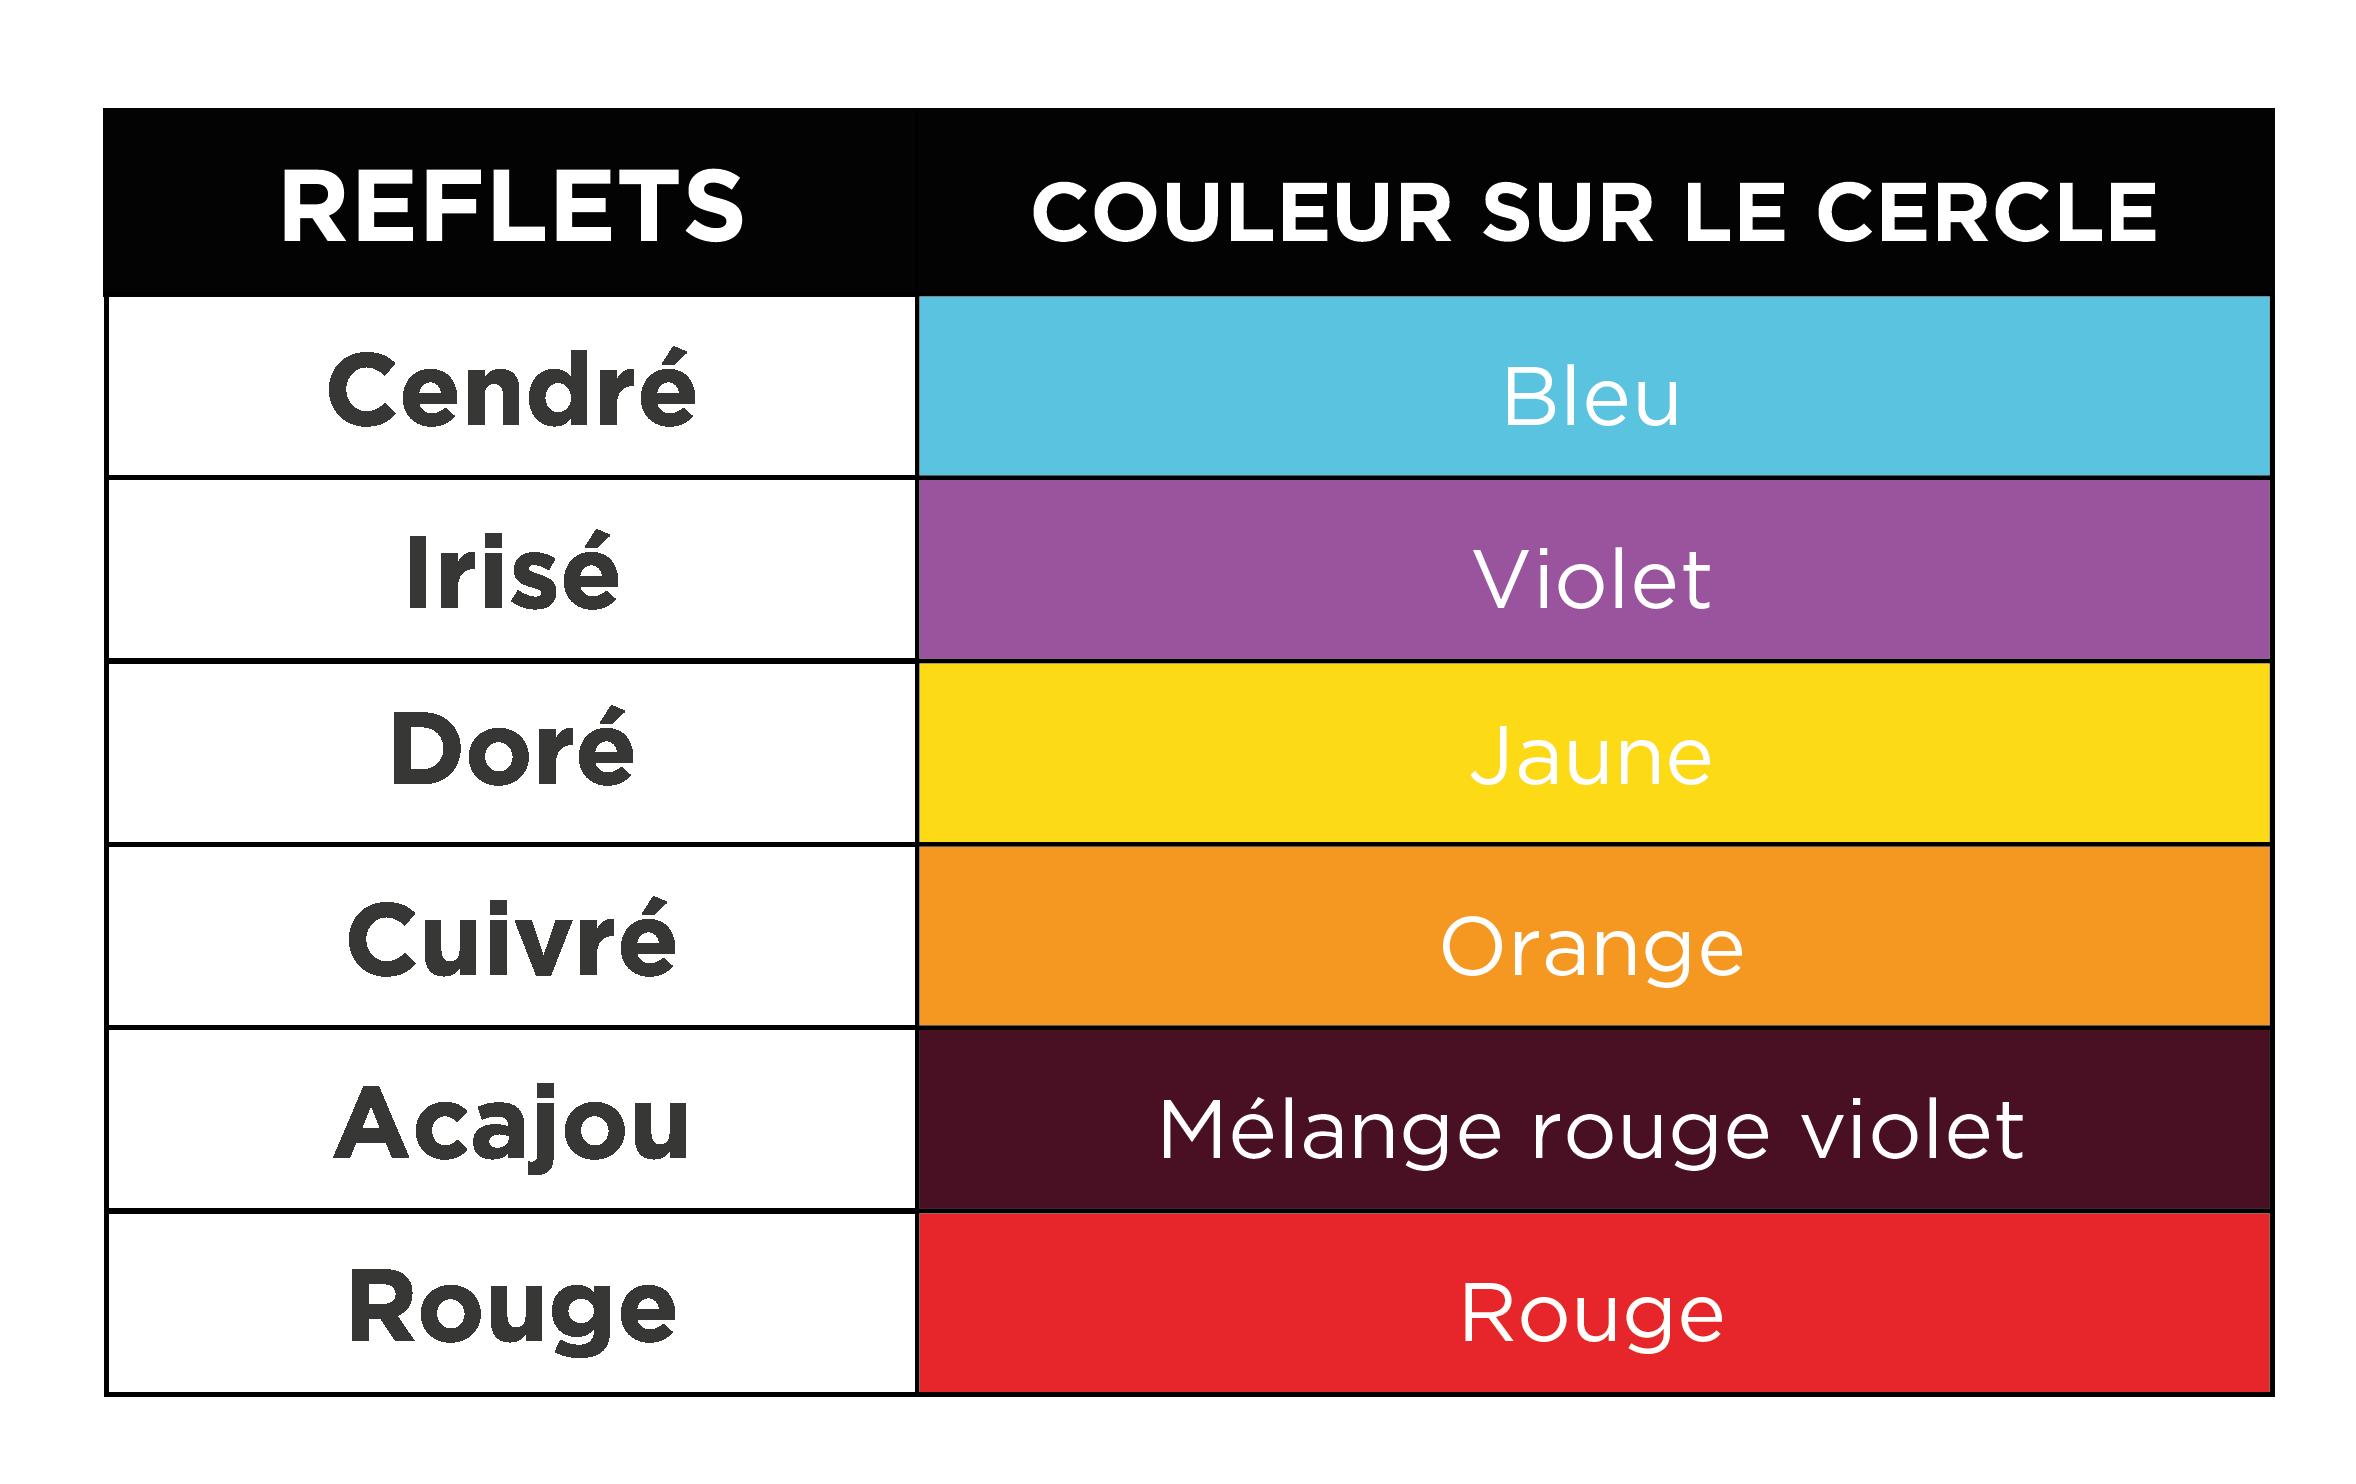 Bleu Libellule La Colorimetrie Base Fondamentale De La Coiffure